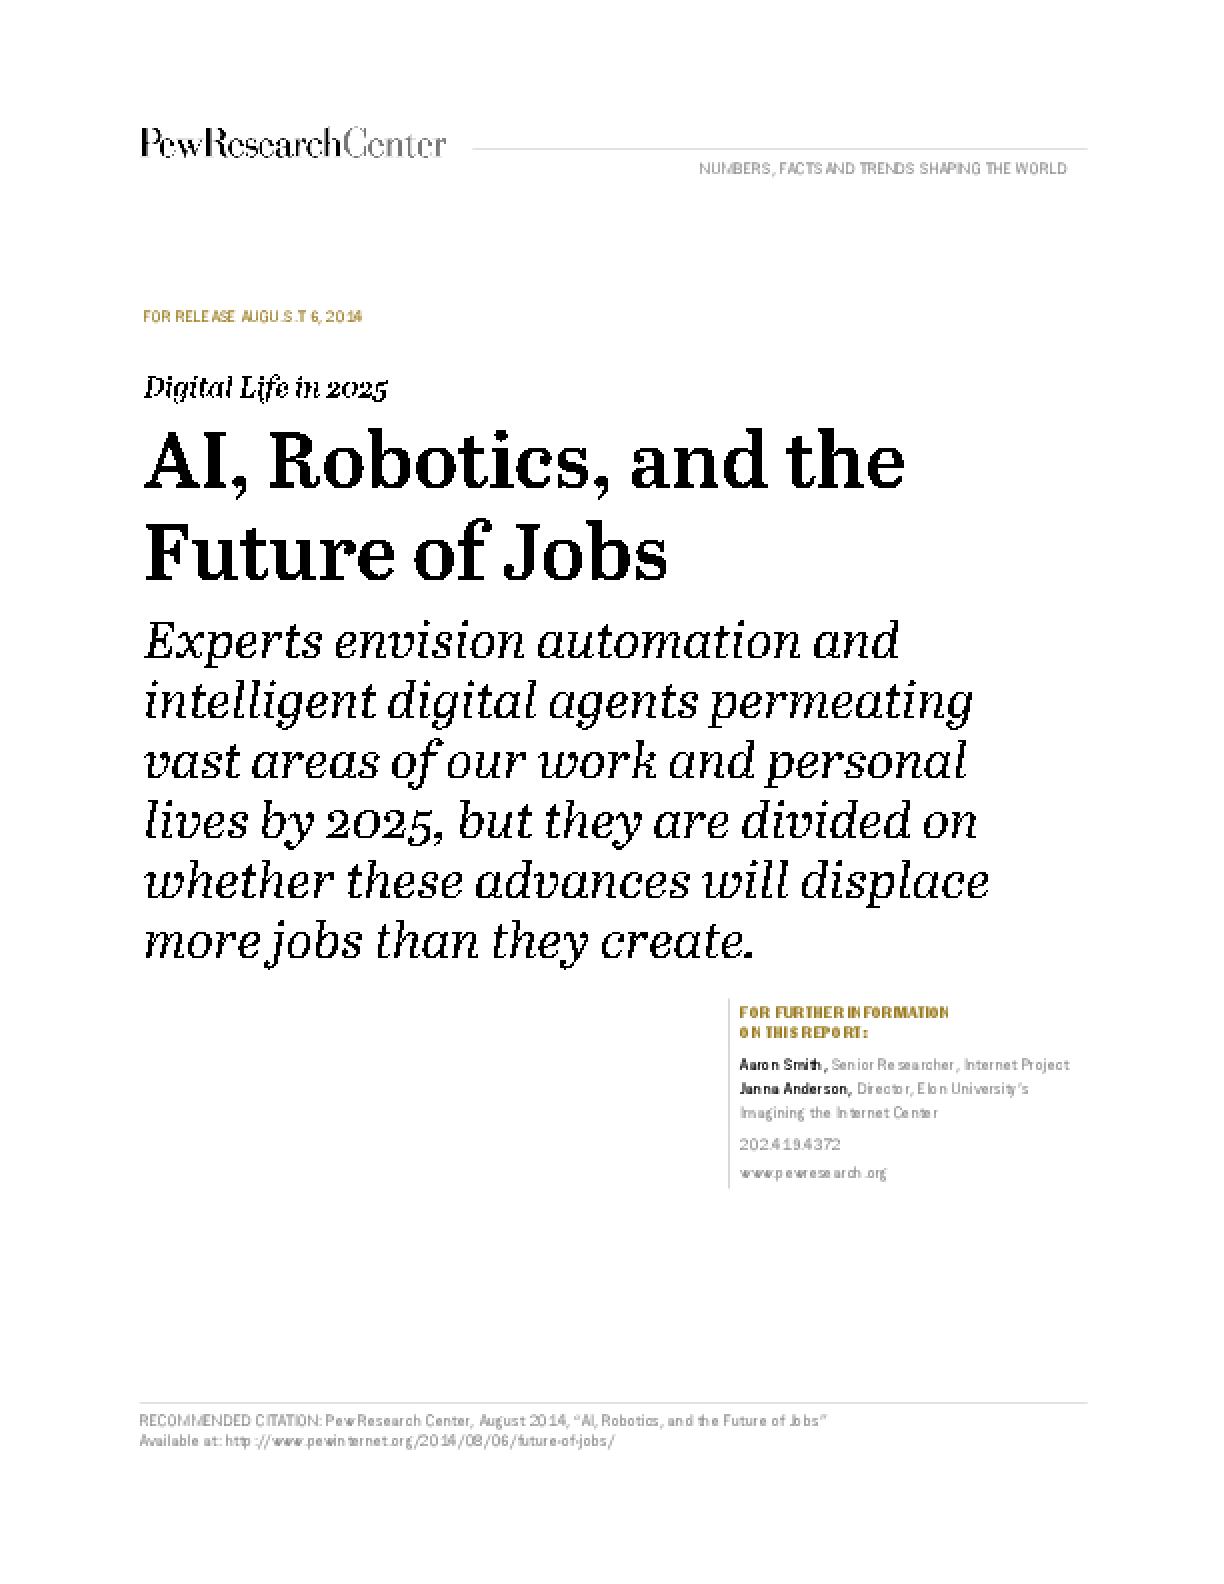 AI, Robotics, and the Future of Jobs